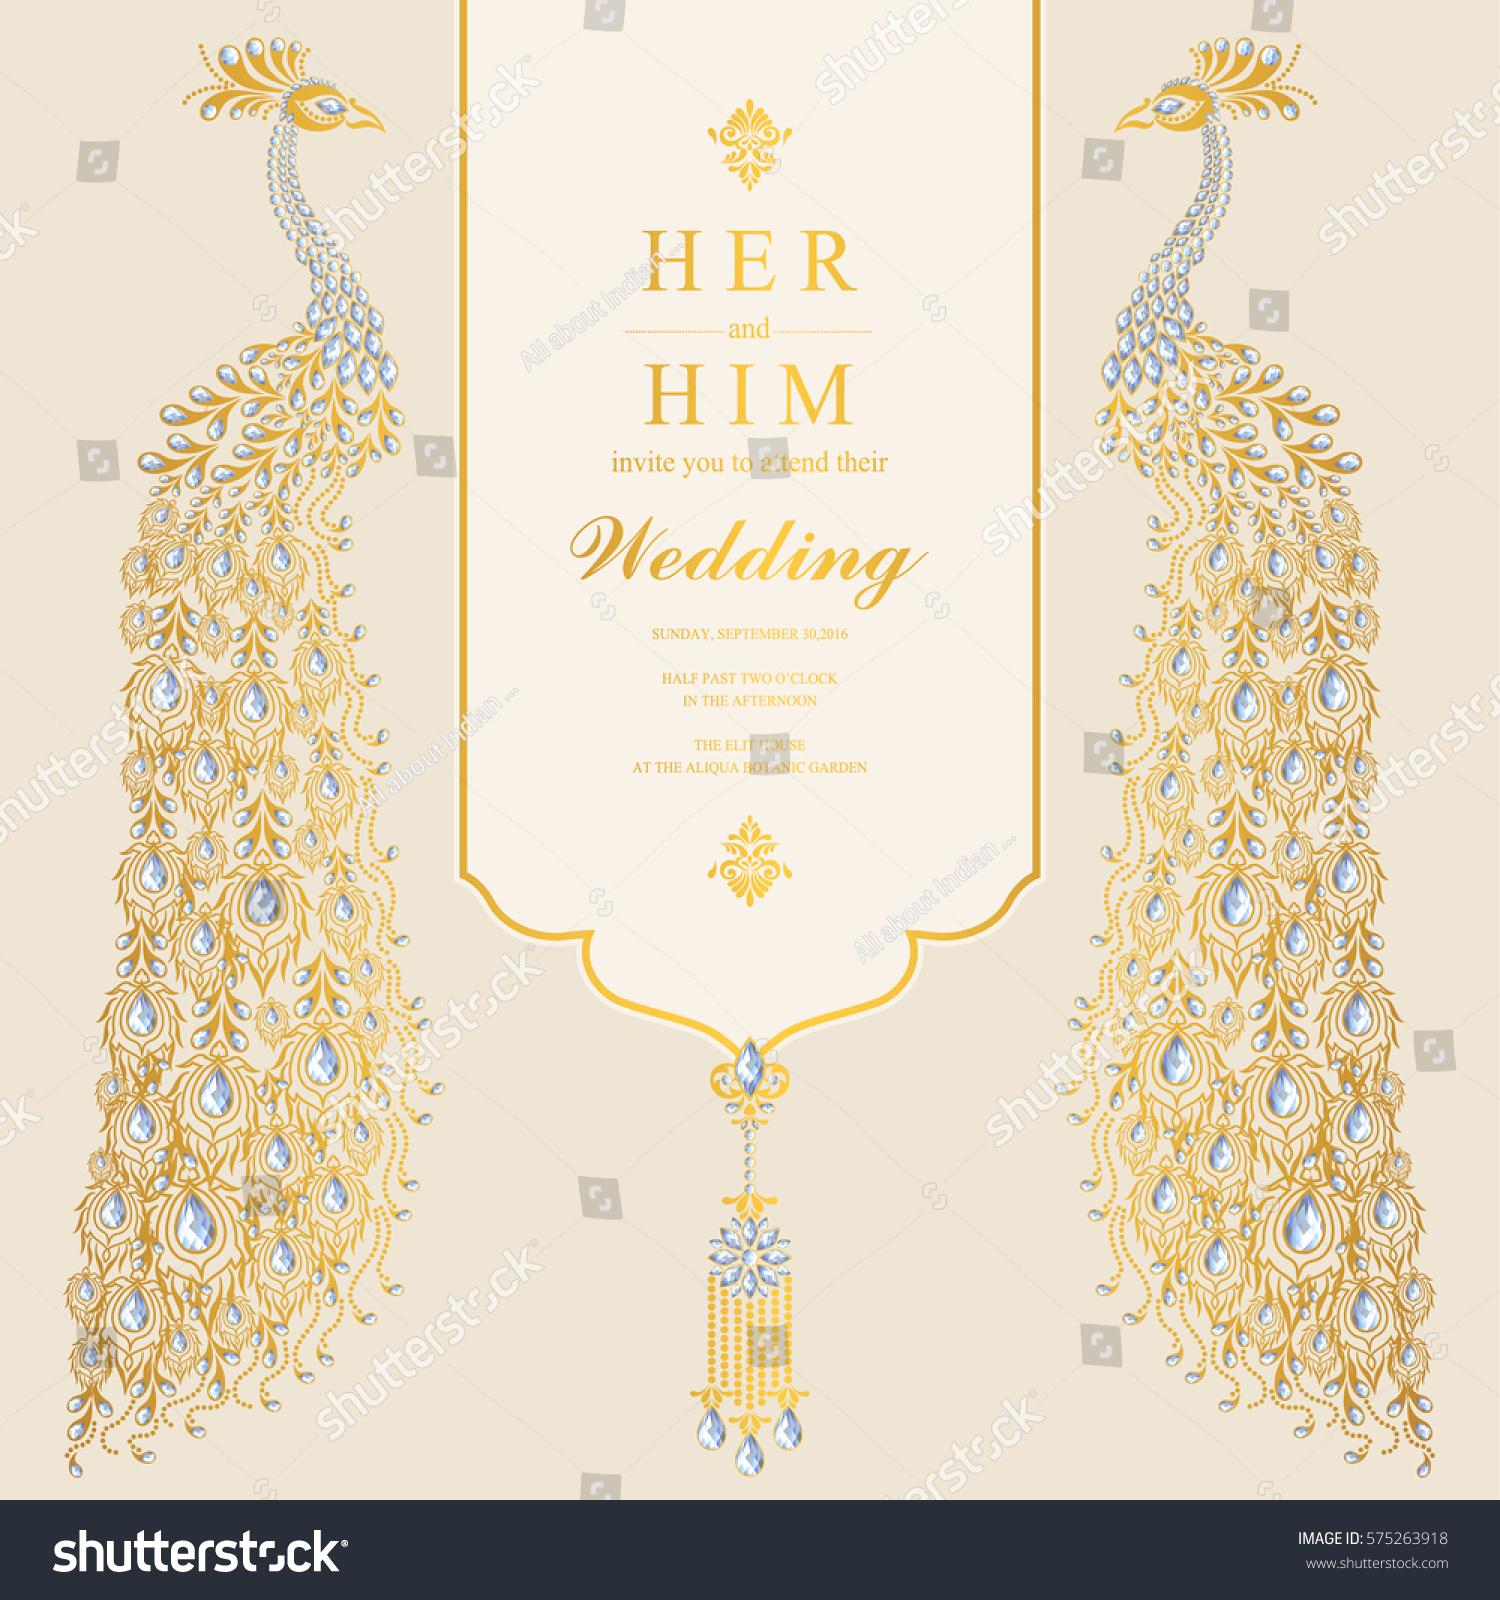 Indian Wedding Invitation Card Templates Gold Stock Vector HD ...